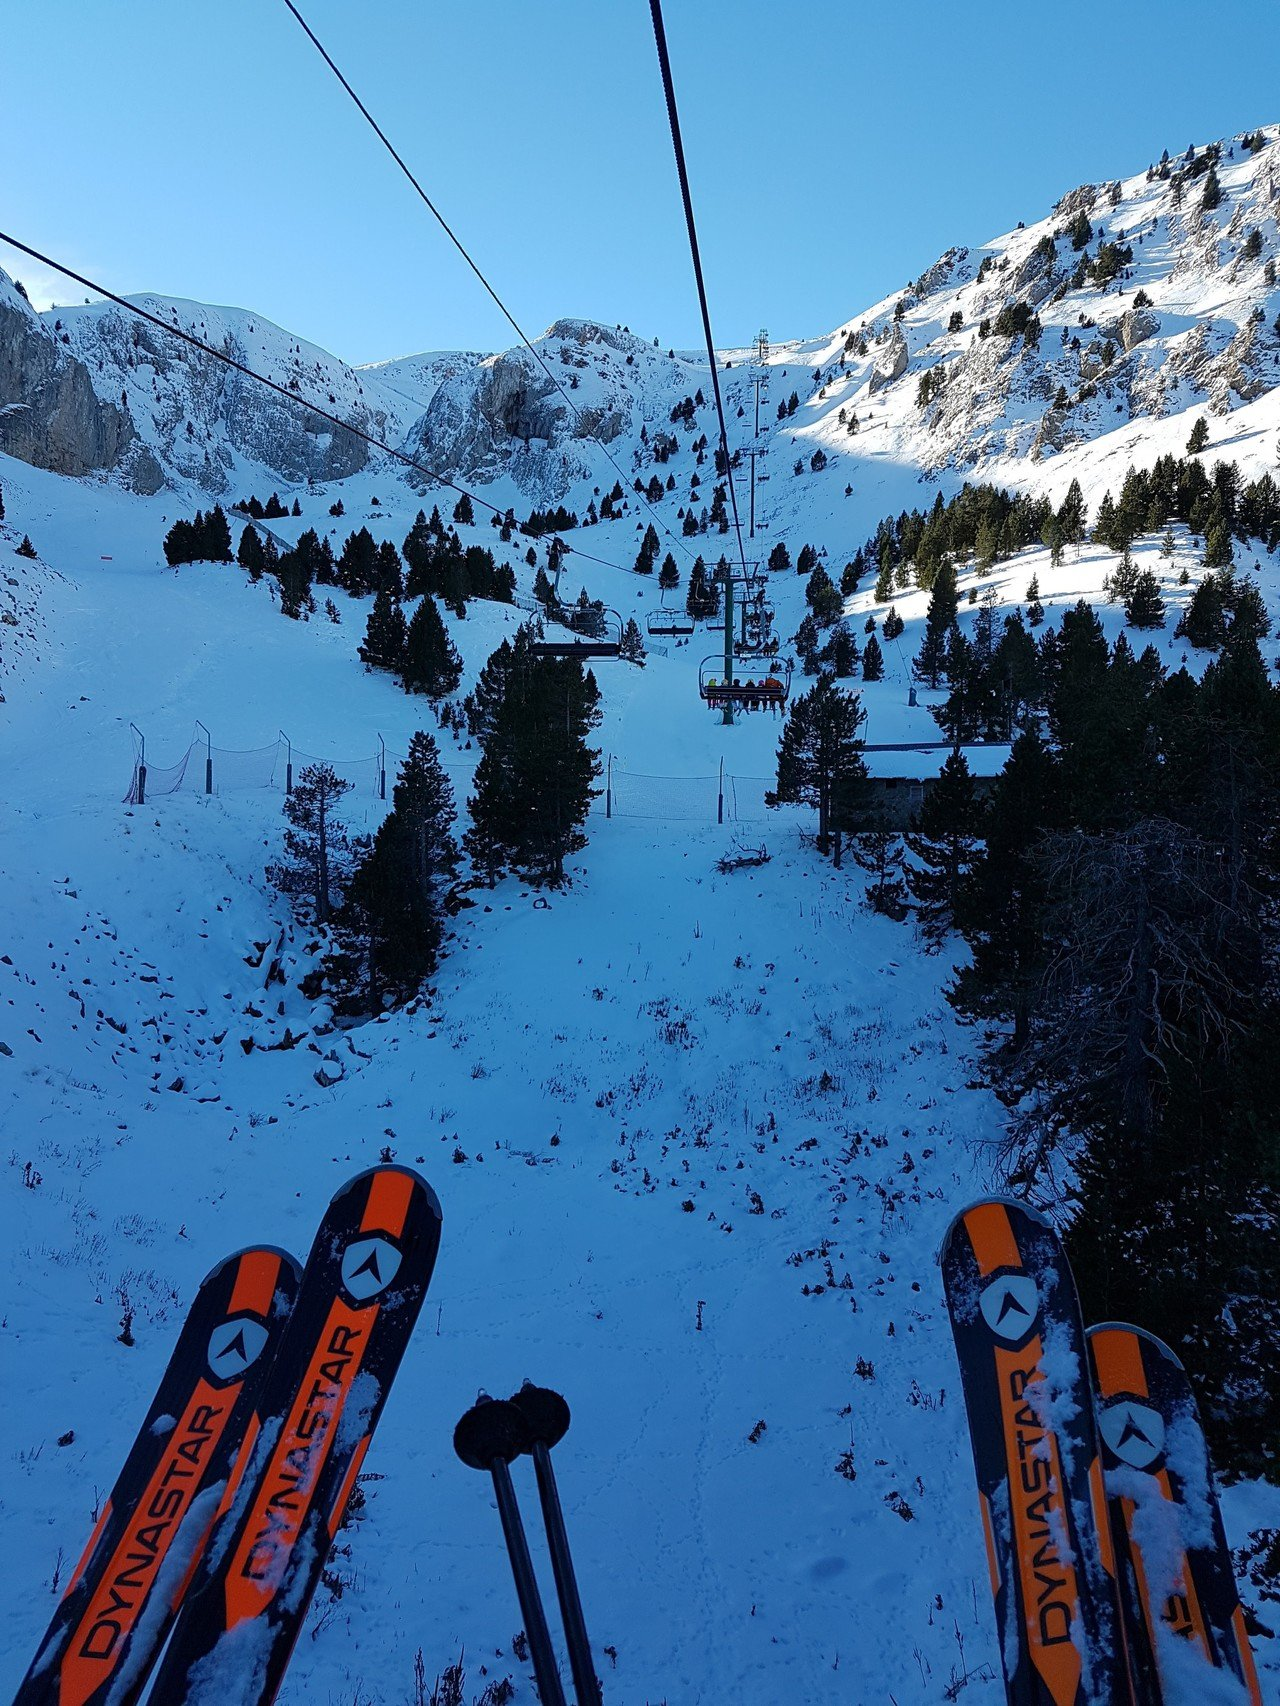 Alp 2500 (Masella+La Molina) 8/12/2016